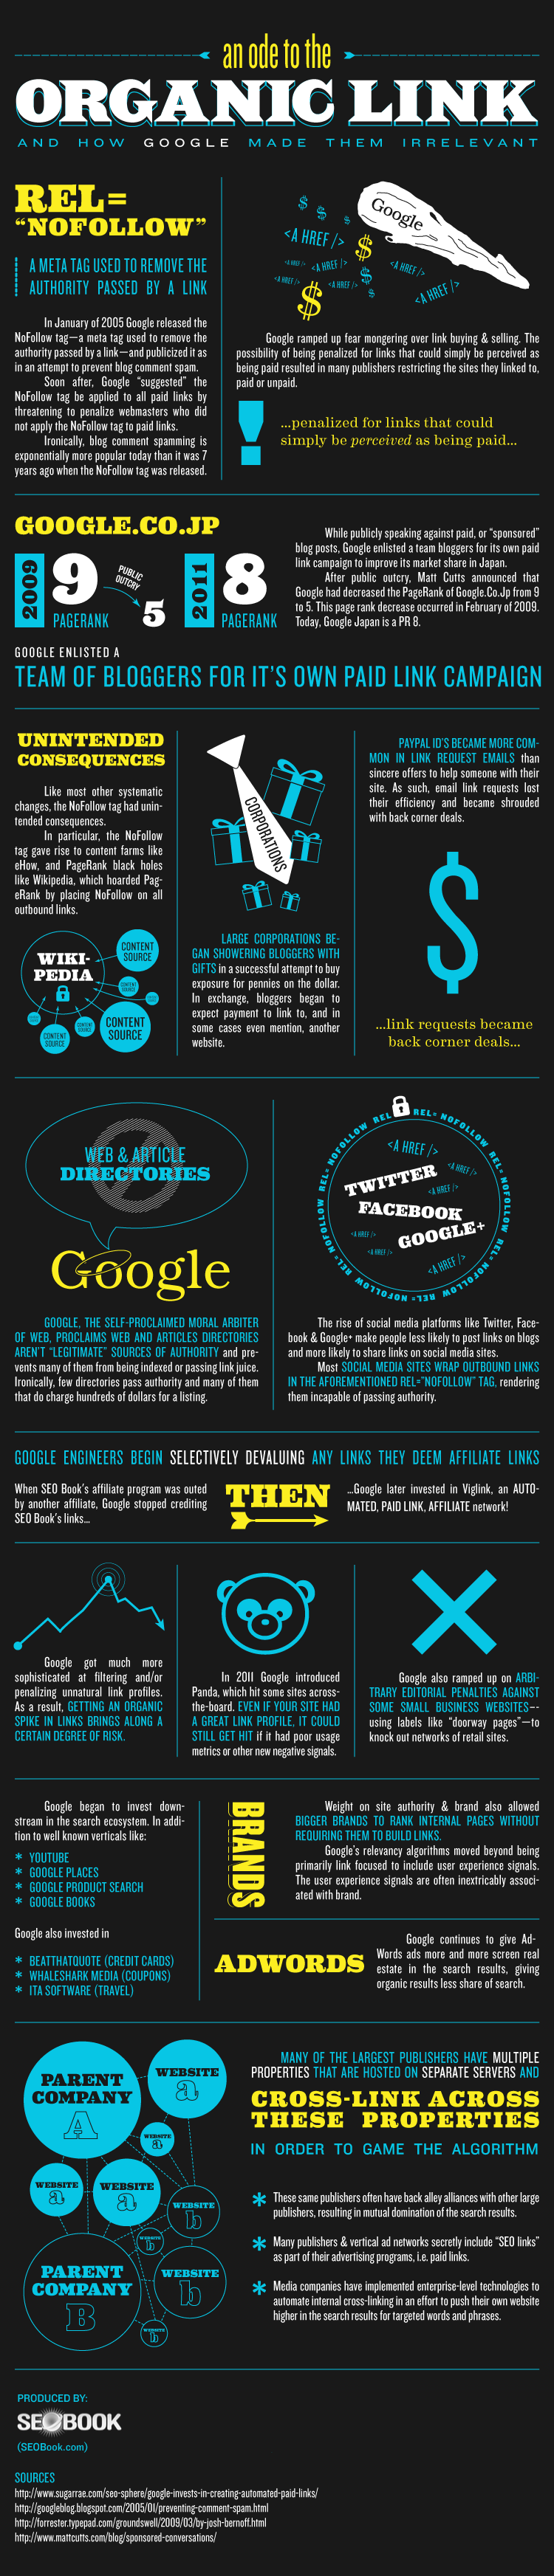 SEOBook Organic Link Infographic